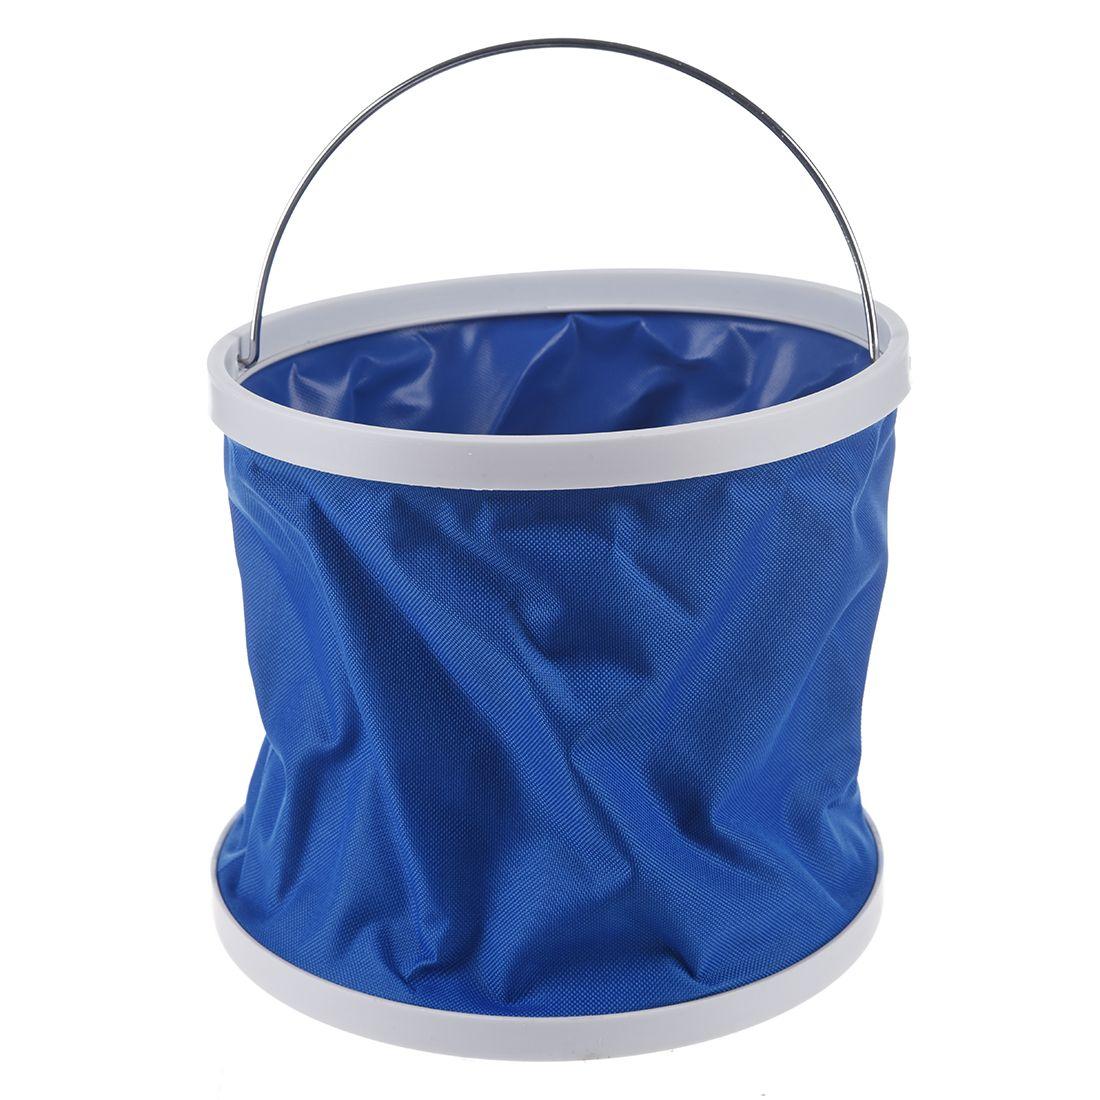 CGDS Outdoor Folding Fishing Camping Car Washing Hiking Water Bucket Barrel 9L